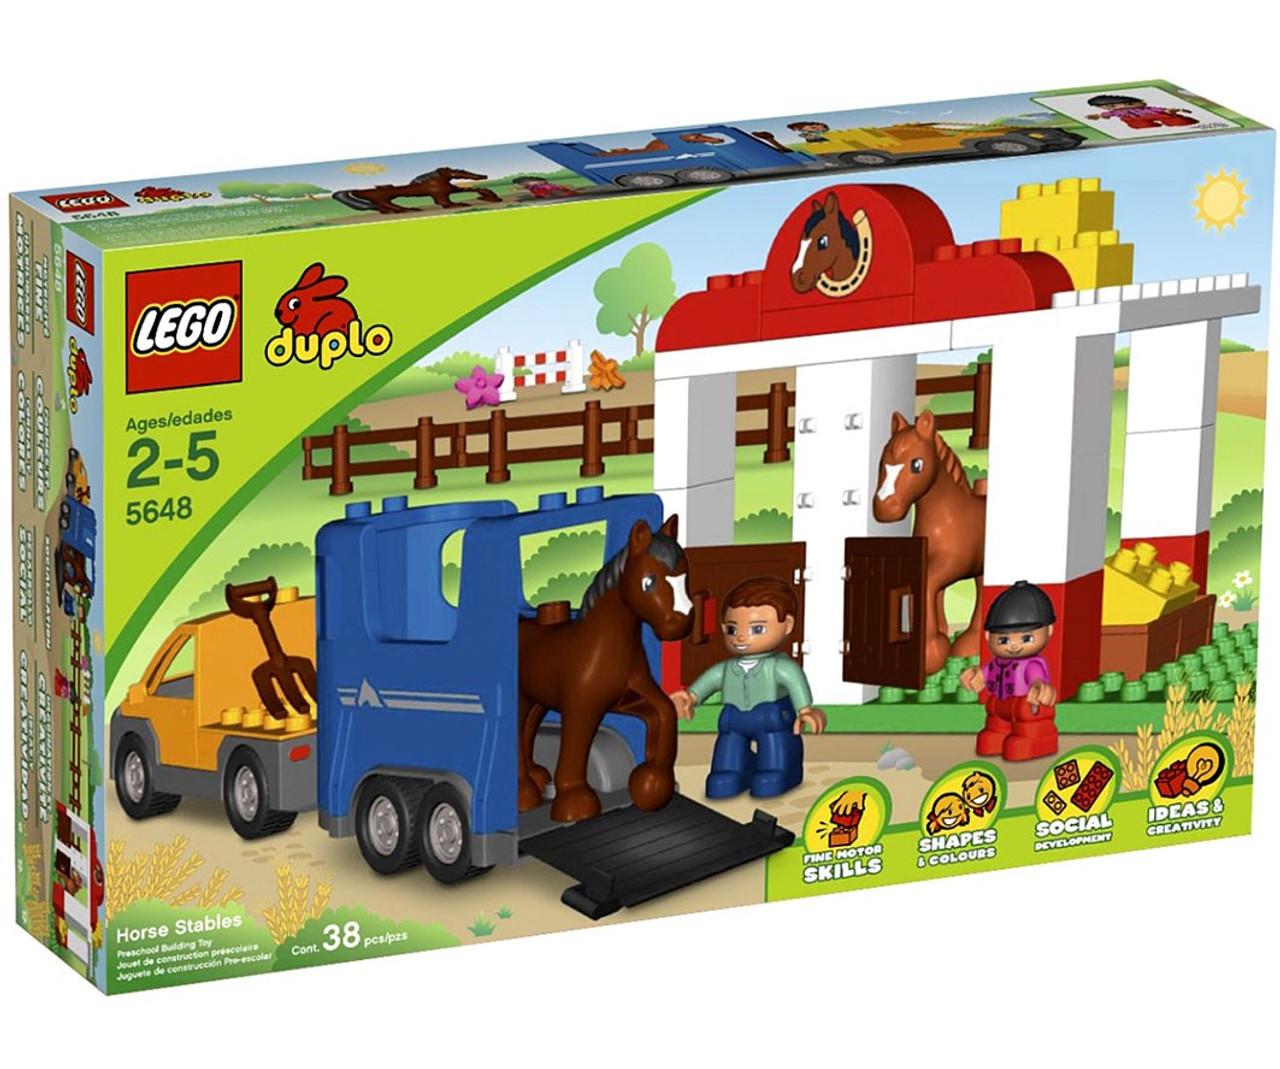 LEGO Duplo Horse Stables Set #5648